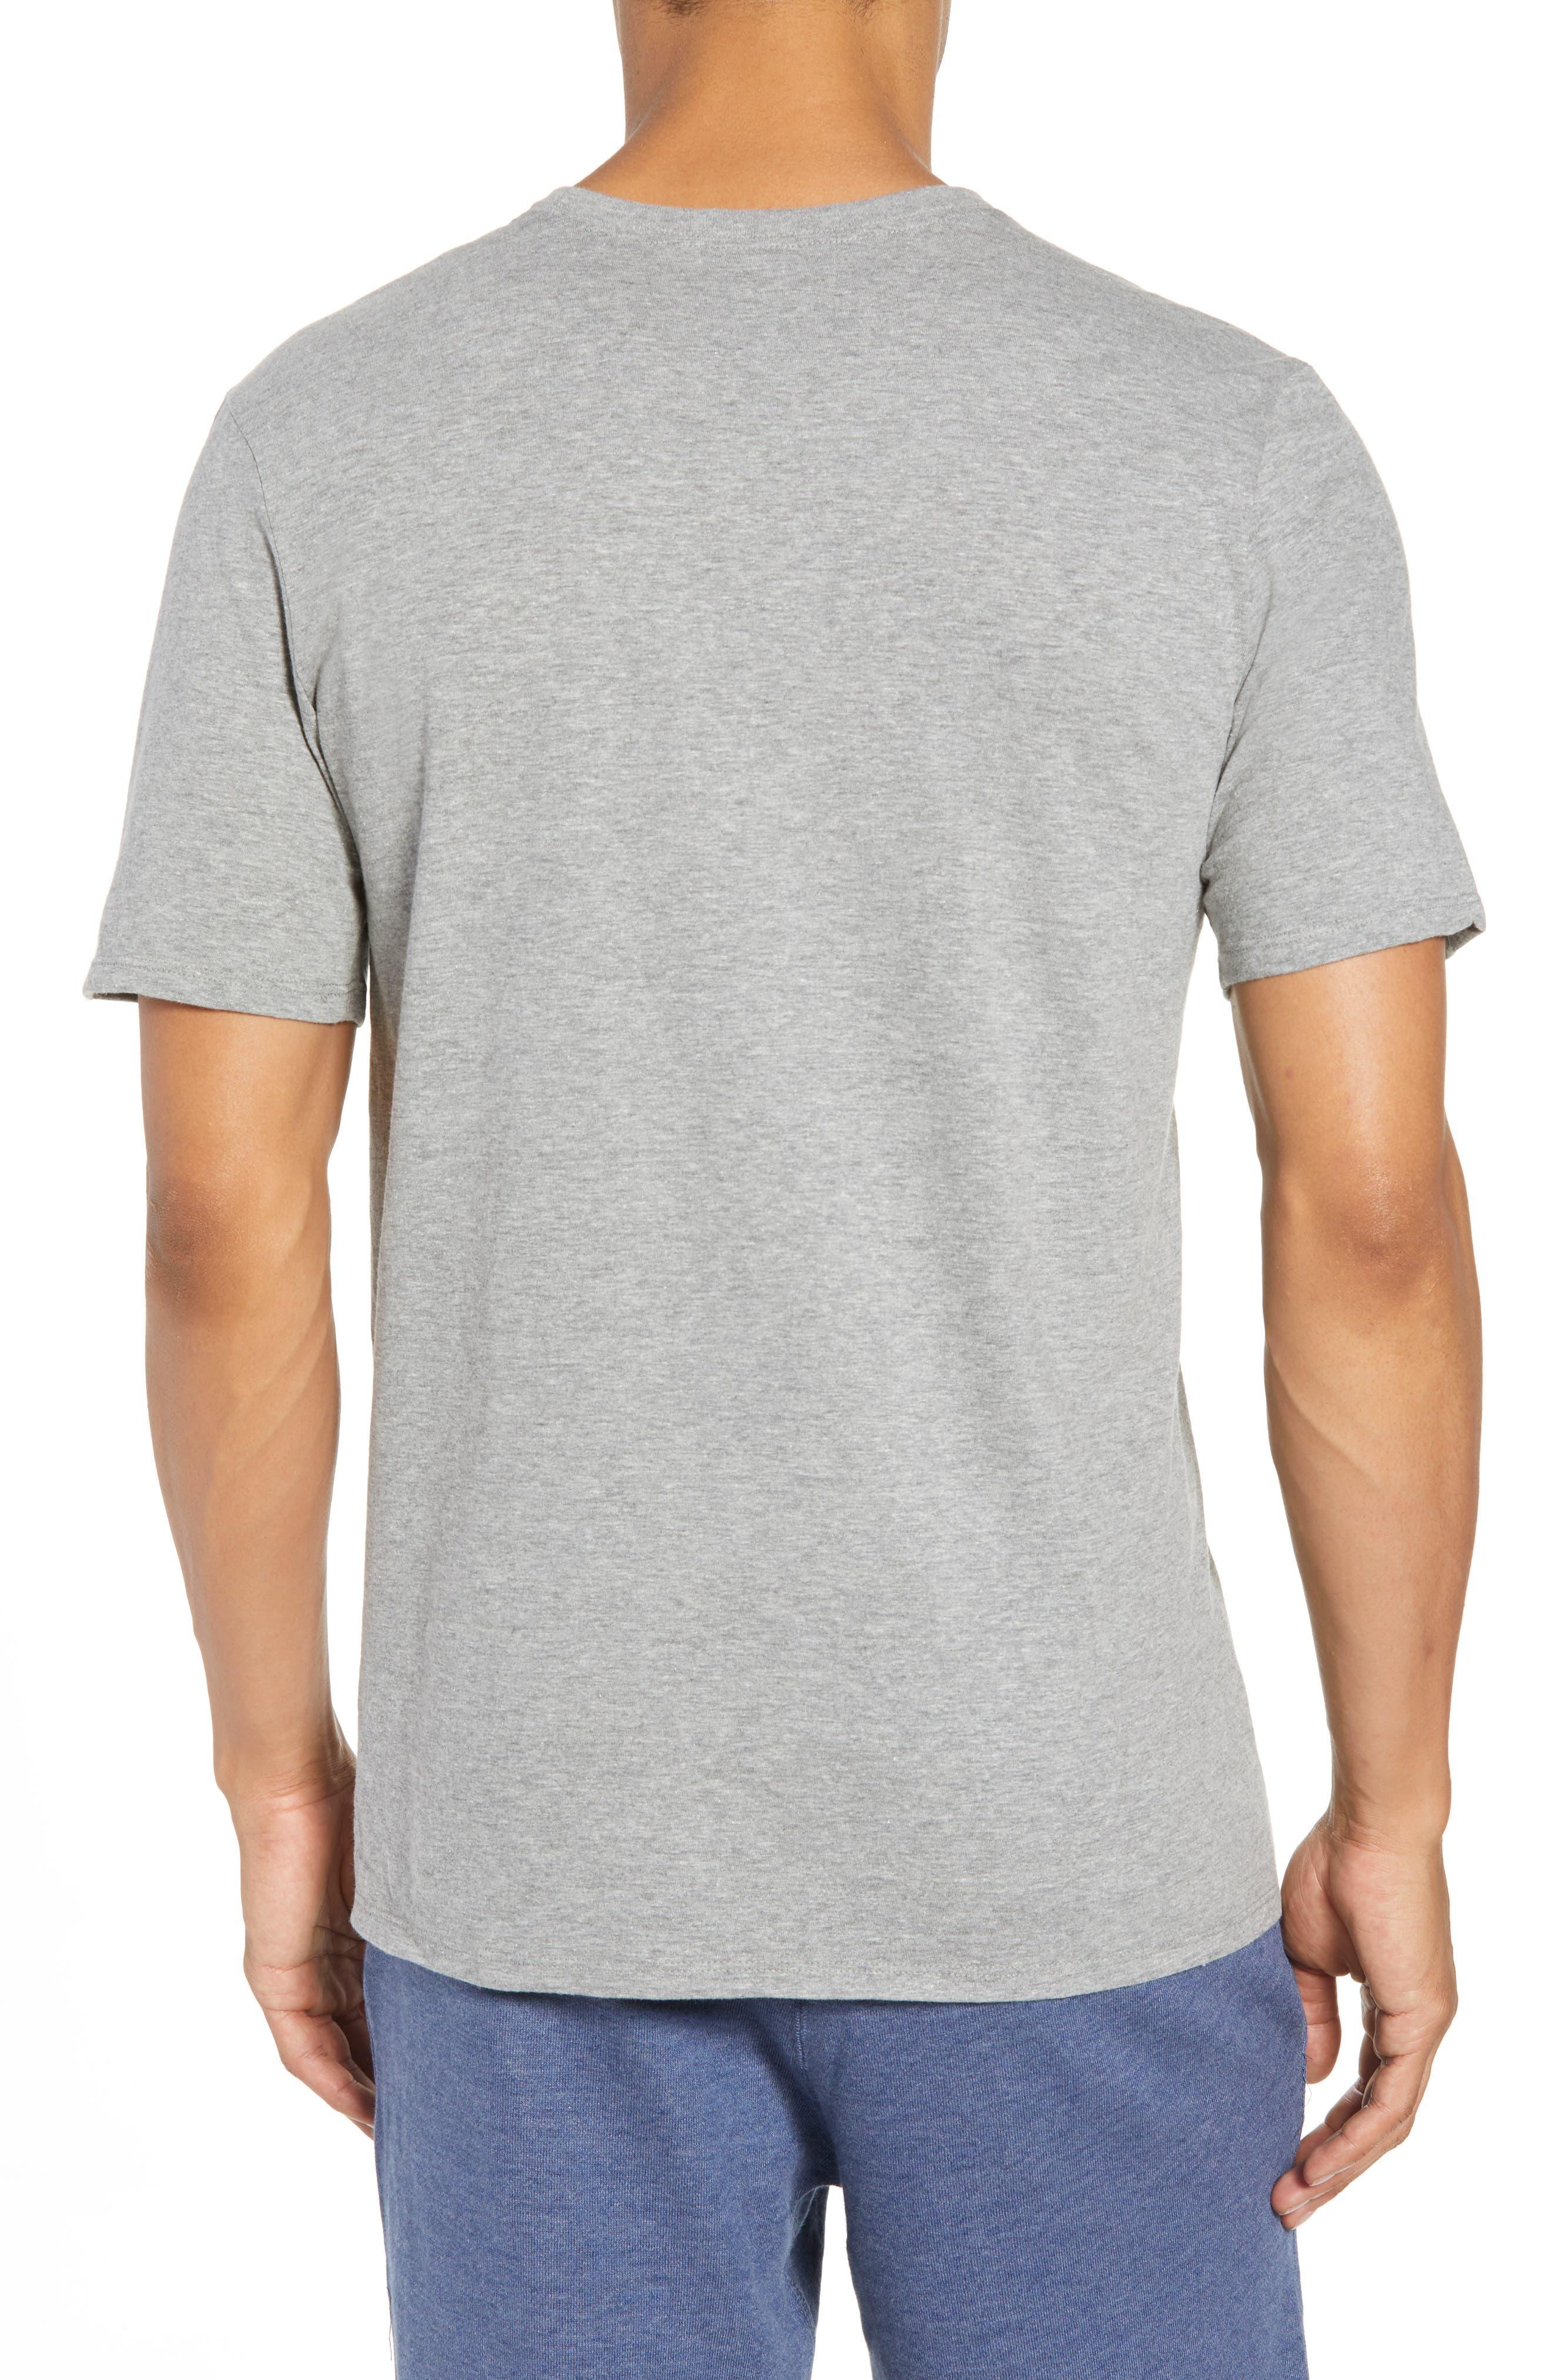 Sportswear More Money T-Shirt,                             Alternate thumbnail 2, color,                             DK GREY HEATHER/ BLACK